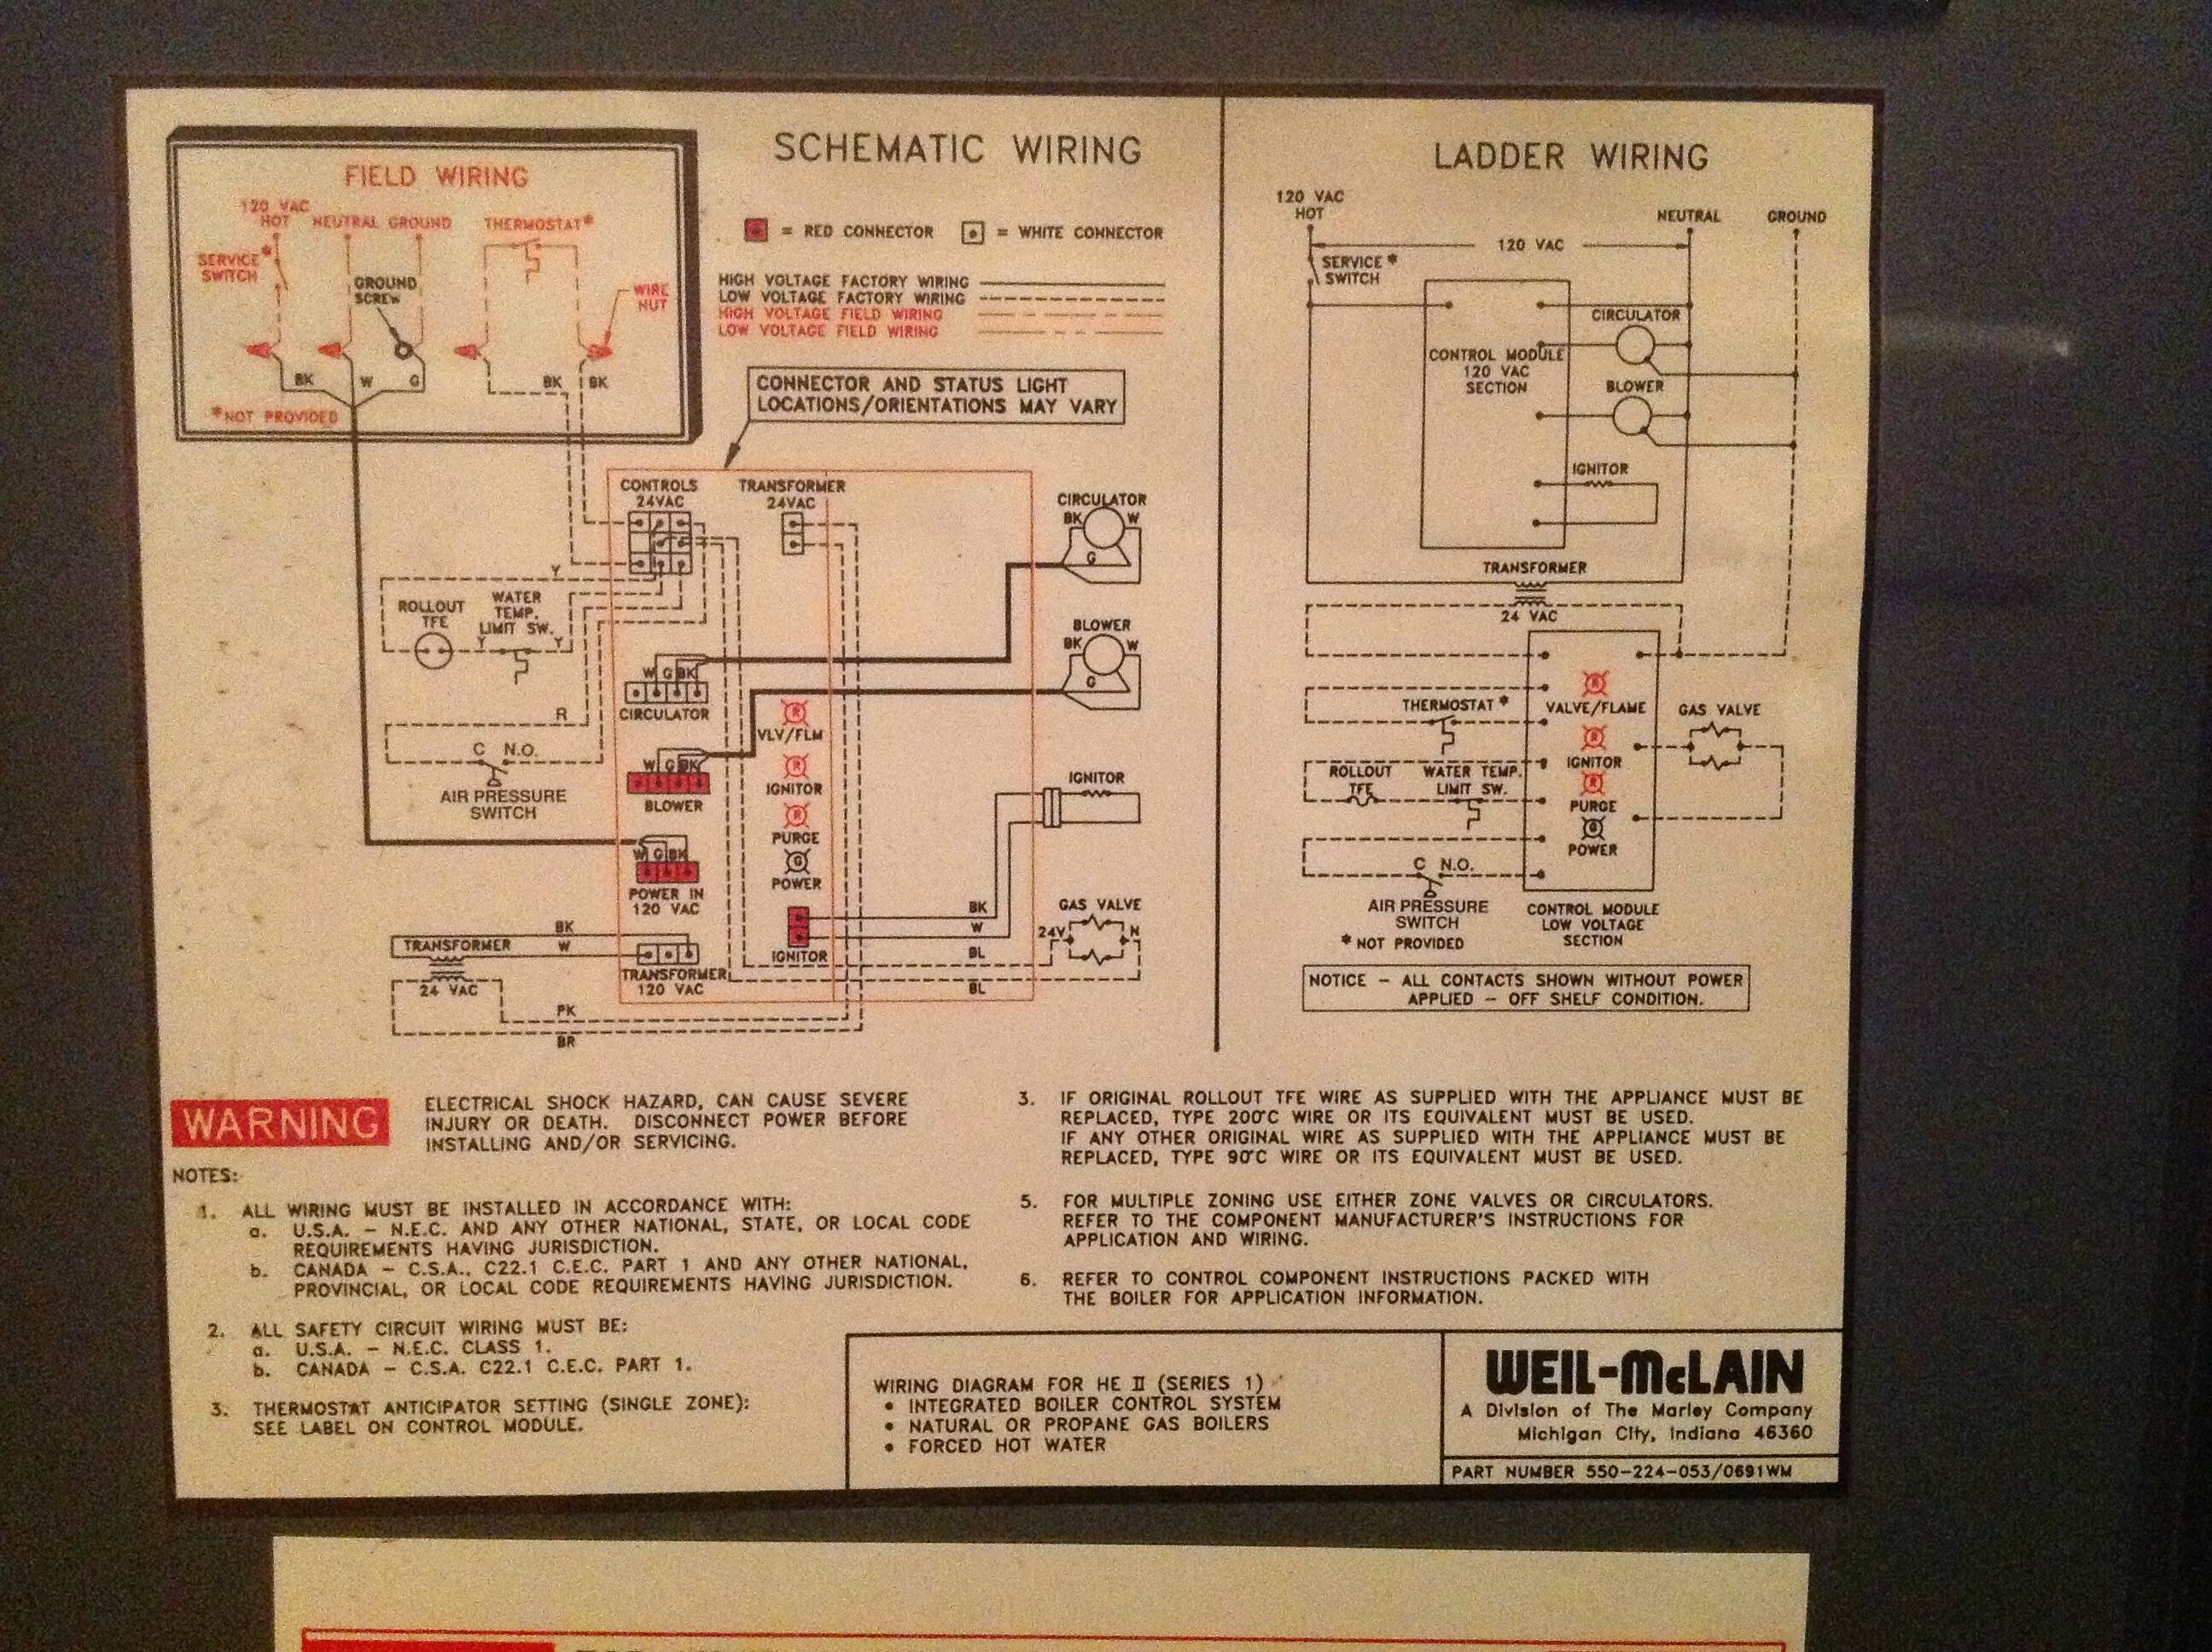 Taco 1632 Wiring Diagram Expert Schematics Pump Wire Timers Zone Valve 555 102 38 Images 4